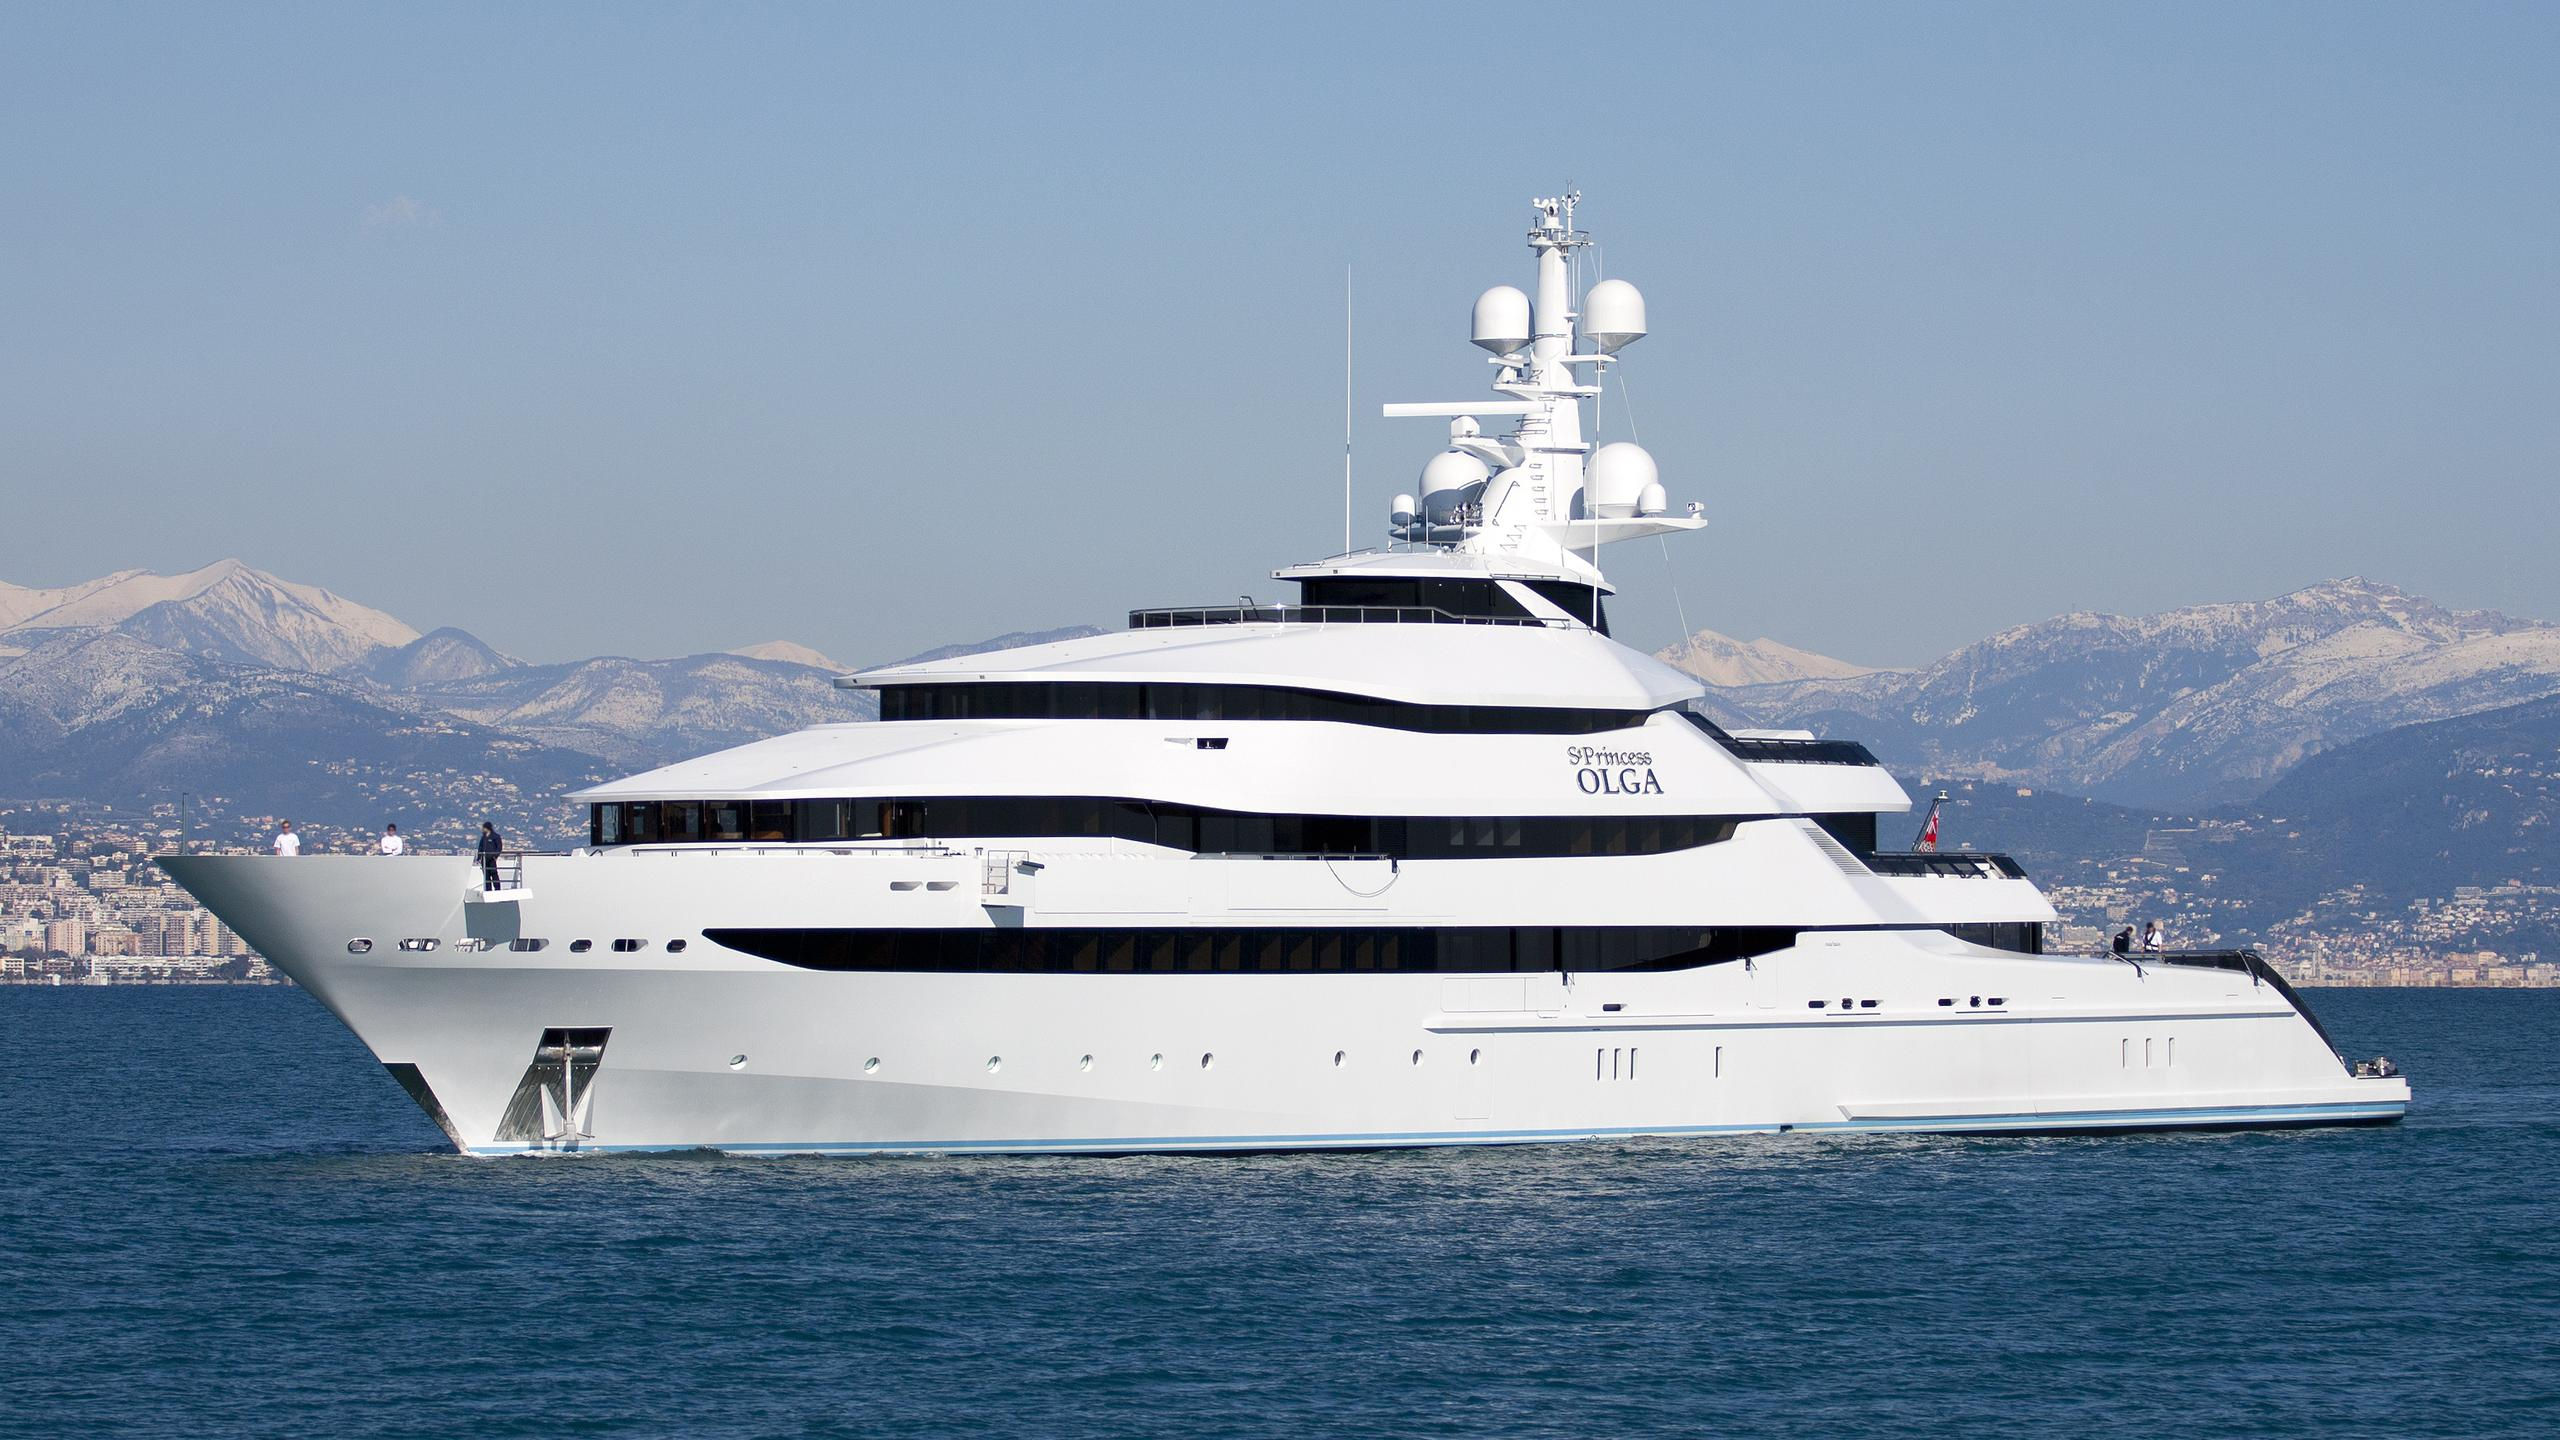 amore-vero-st-princess-olga-yacht-exterior